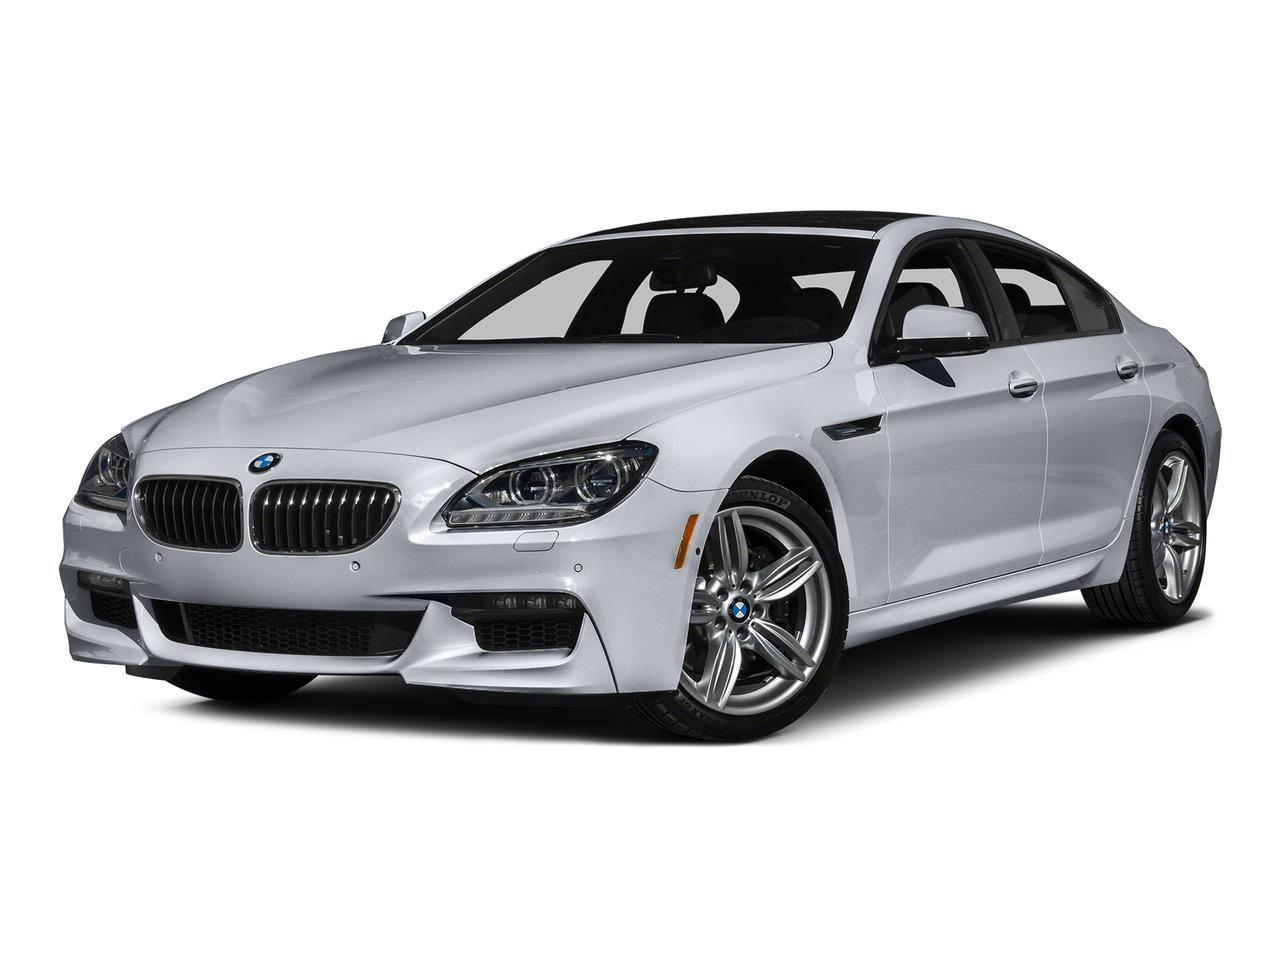 2015 BMW 650i Vehicle Photo in Oklahoma City, OK 73114